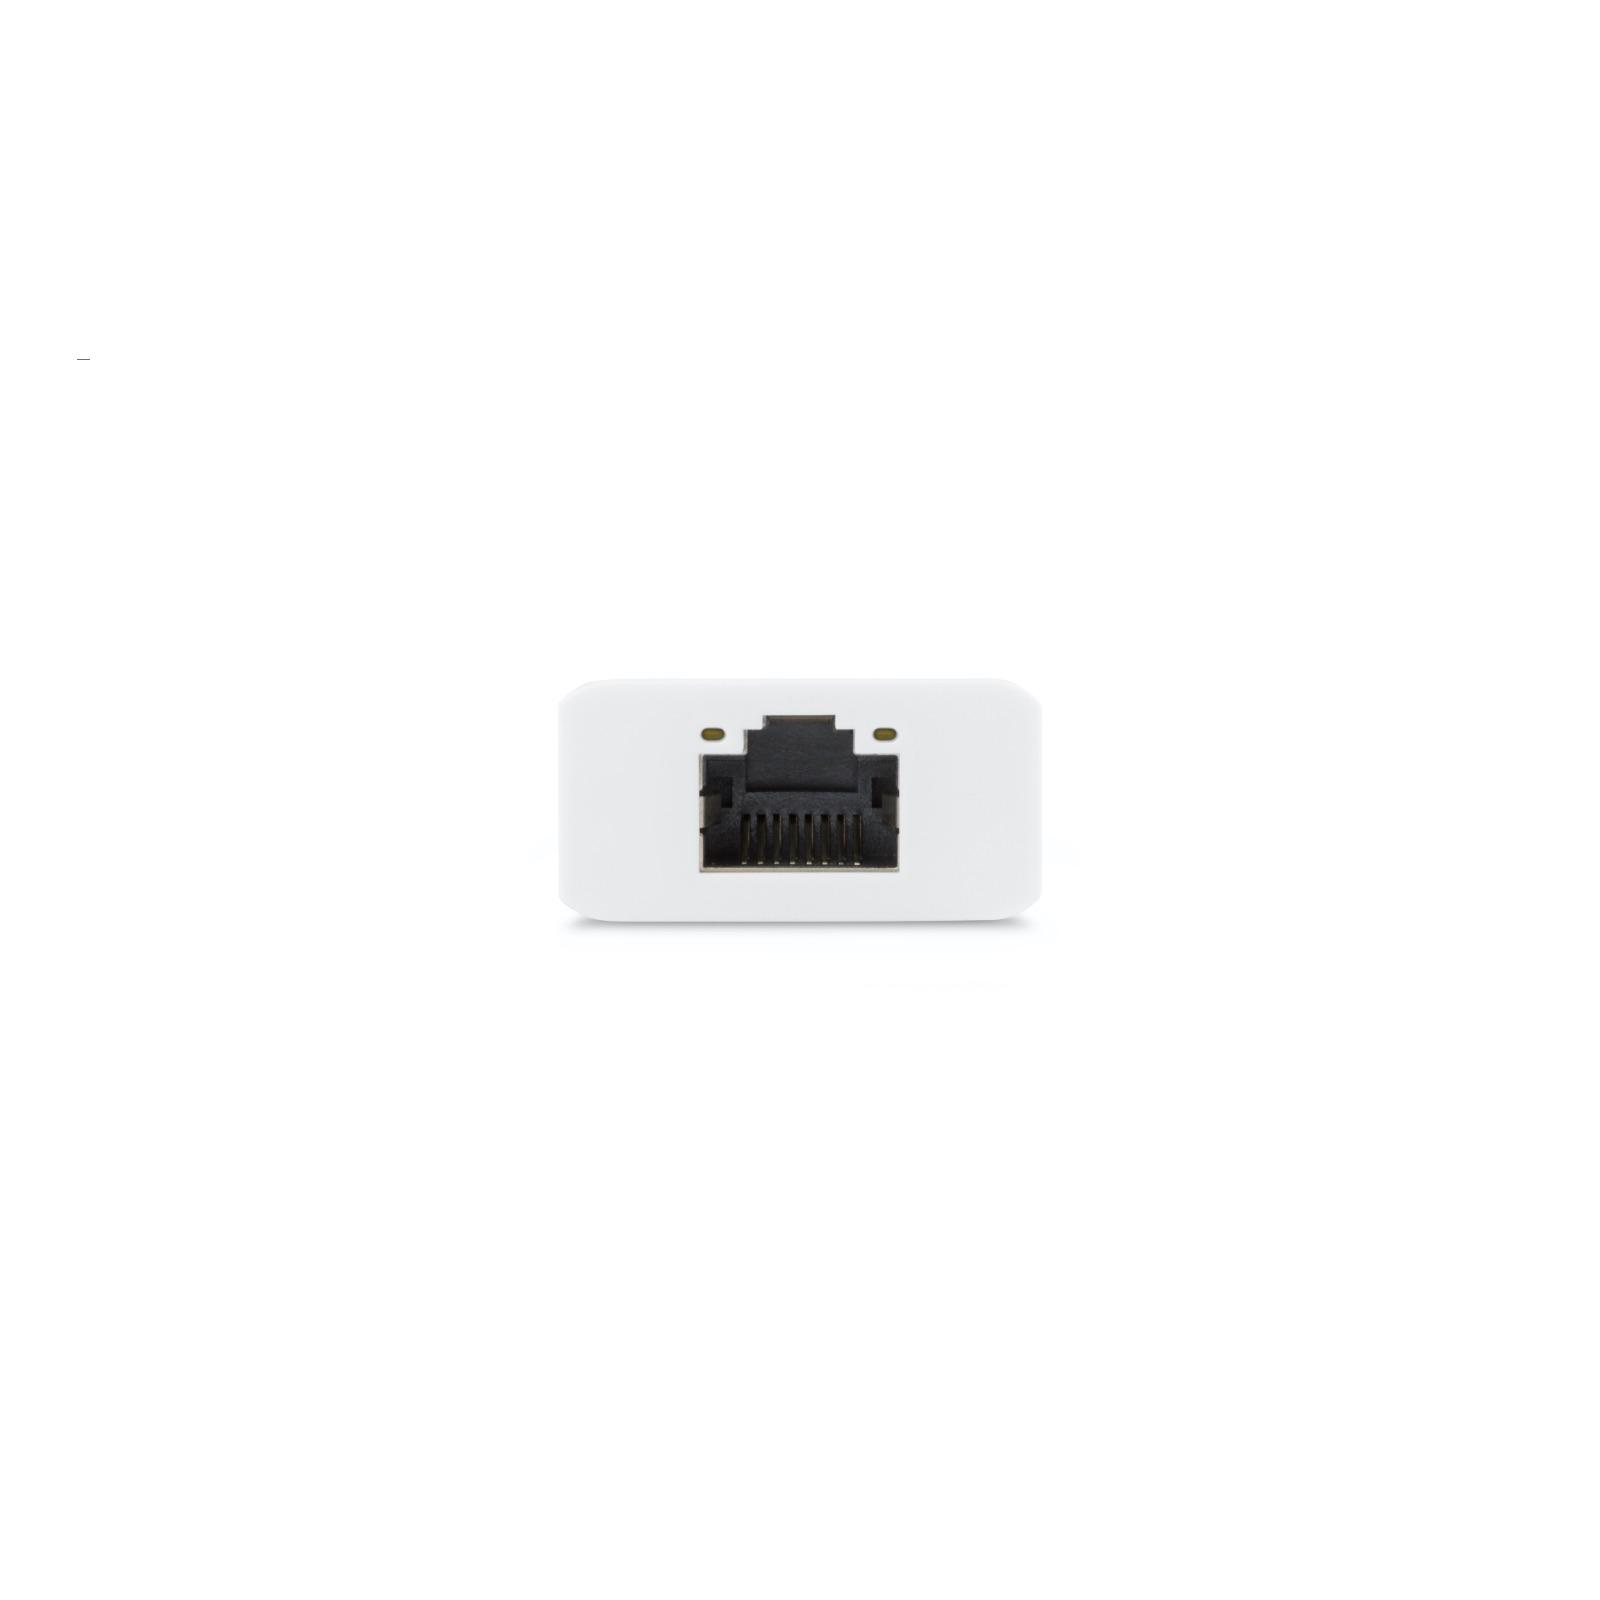 USB 3.0 to Gigabit Ethernet Adapter-image